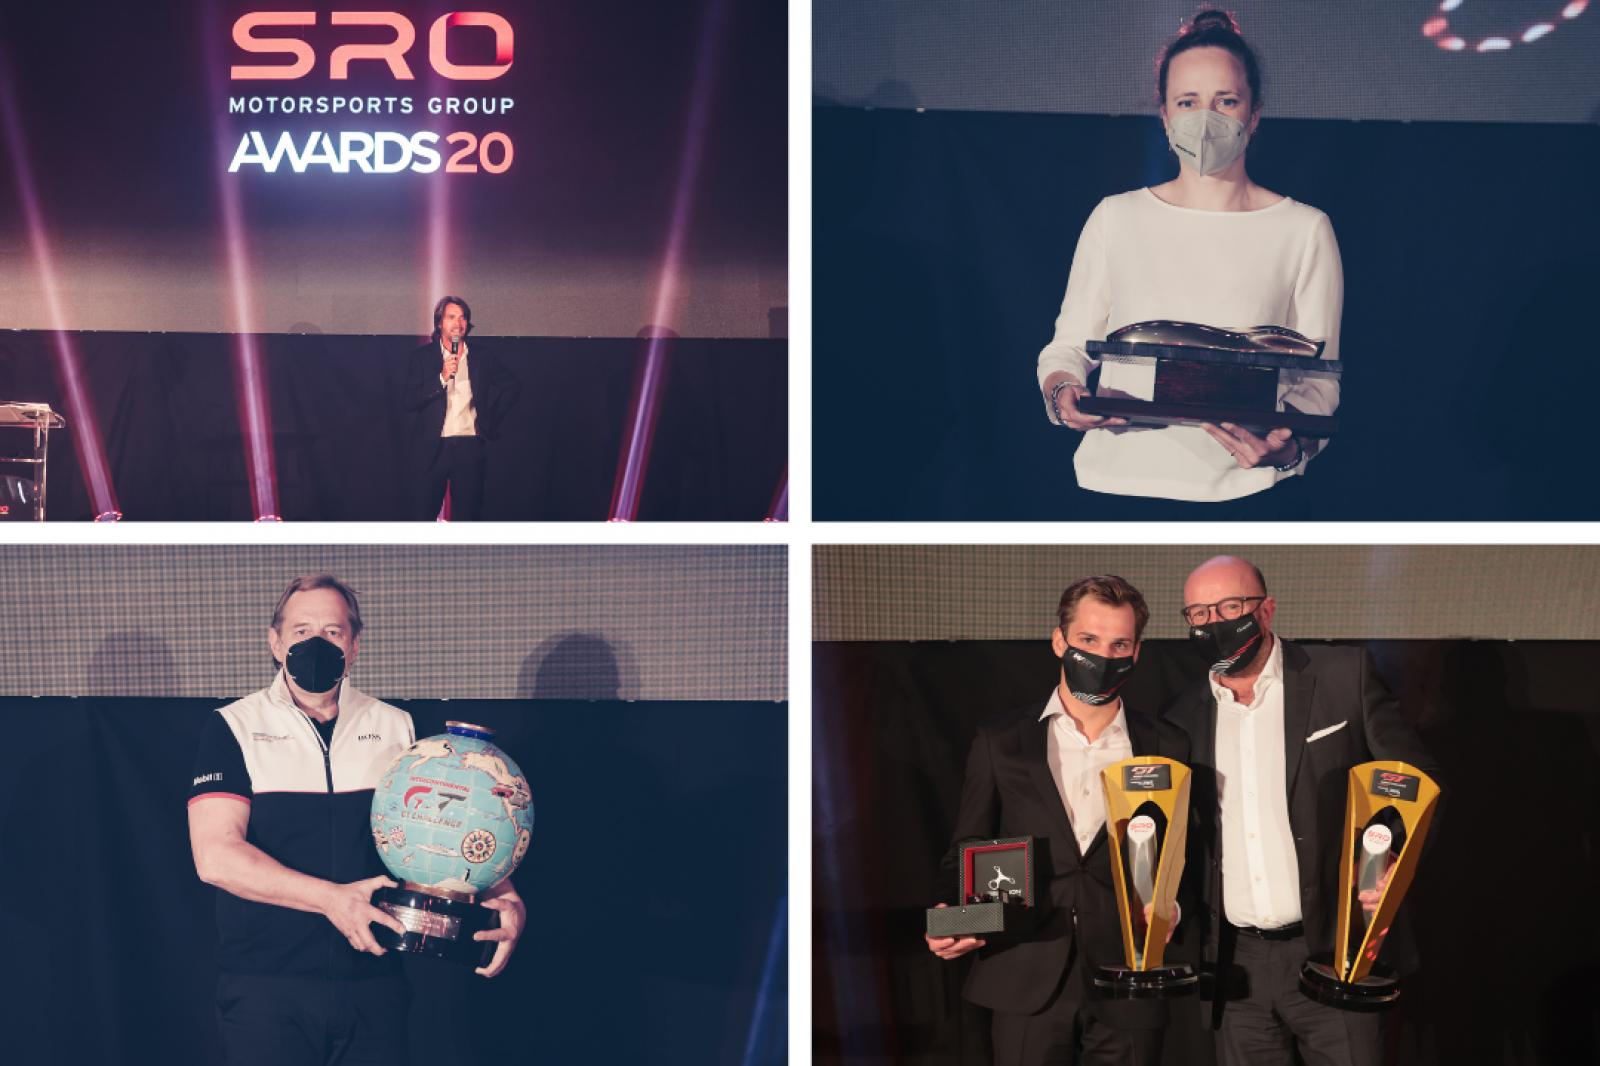 SRO Motorsports Group crowns 2020 European champions at Circuit Paul Ricard